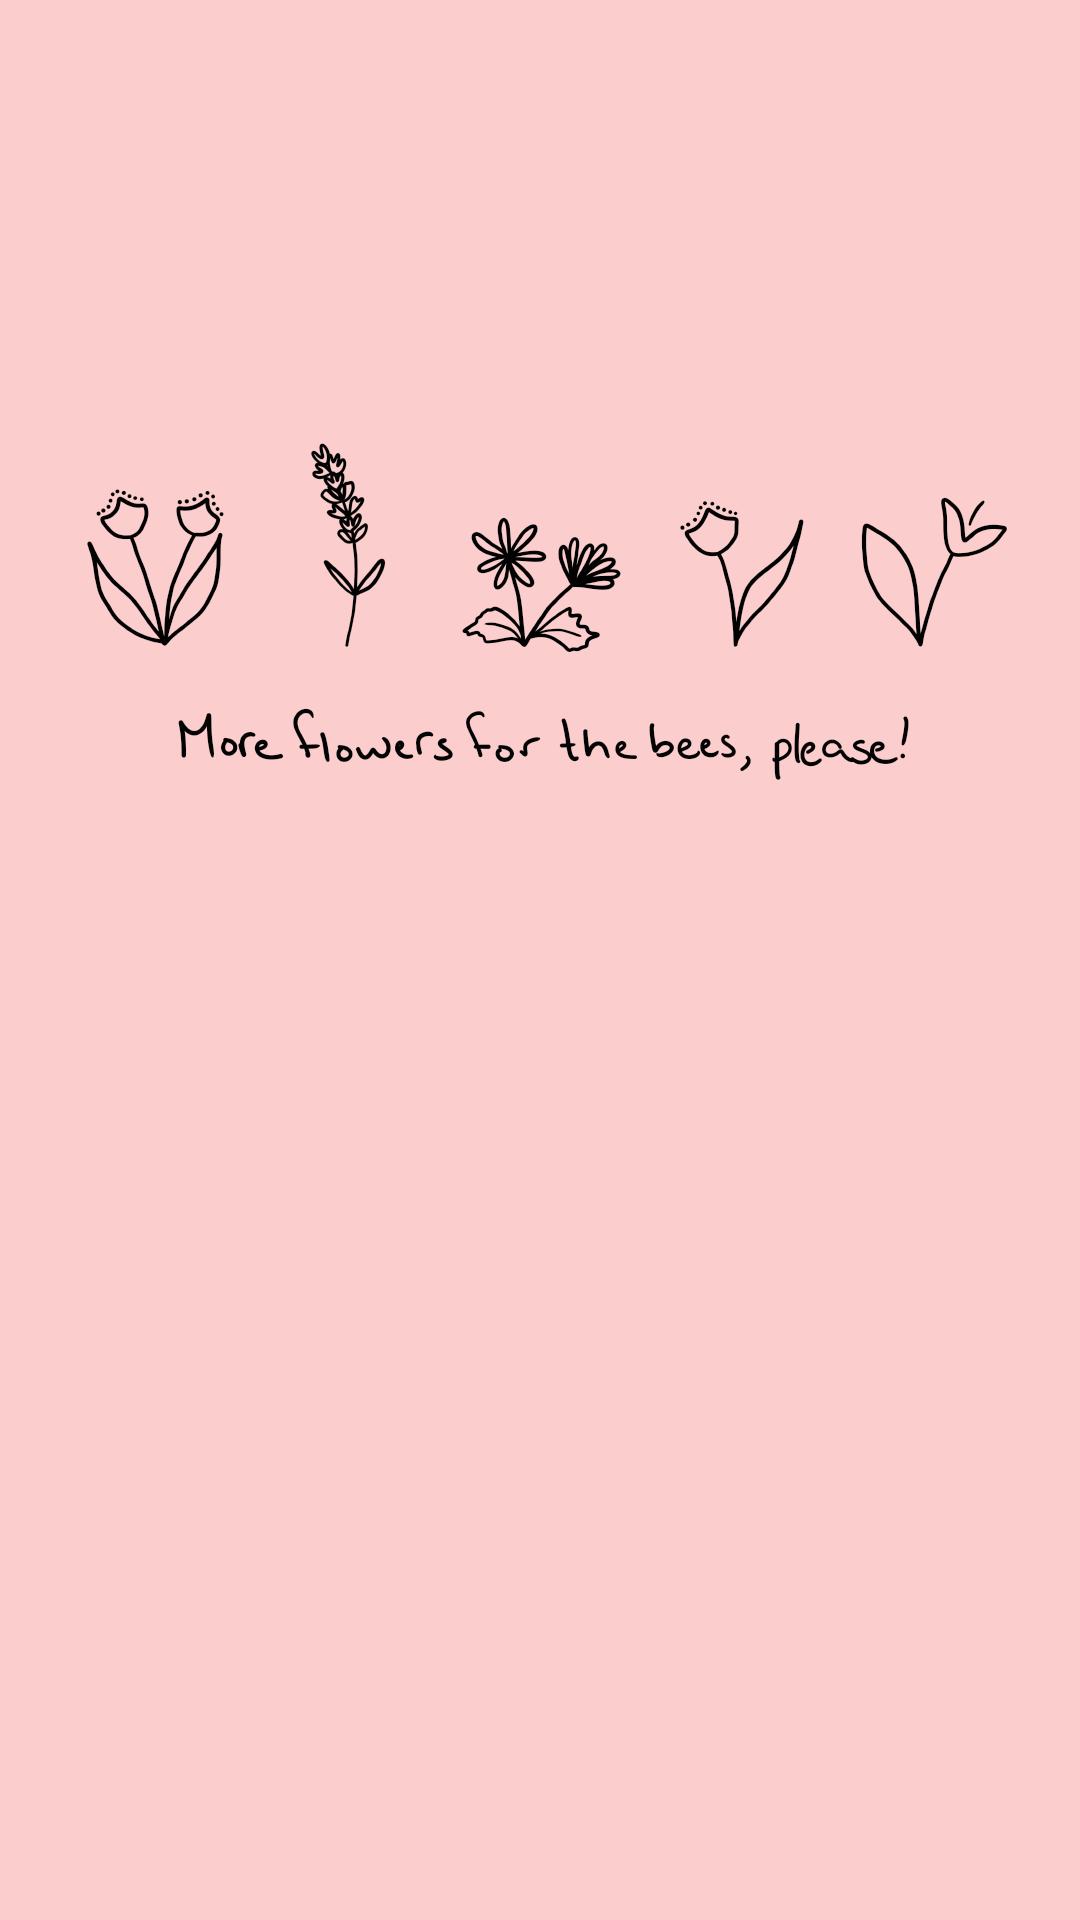 Pink Aesthetic Wallpaper Cute Pastel Wallpaper Pink Wallpaper Iphone Pink Aesthetic